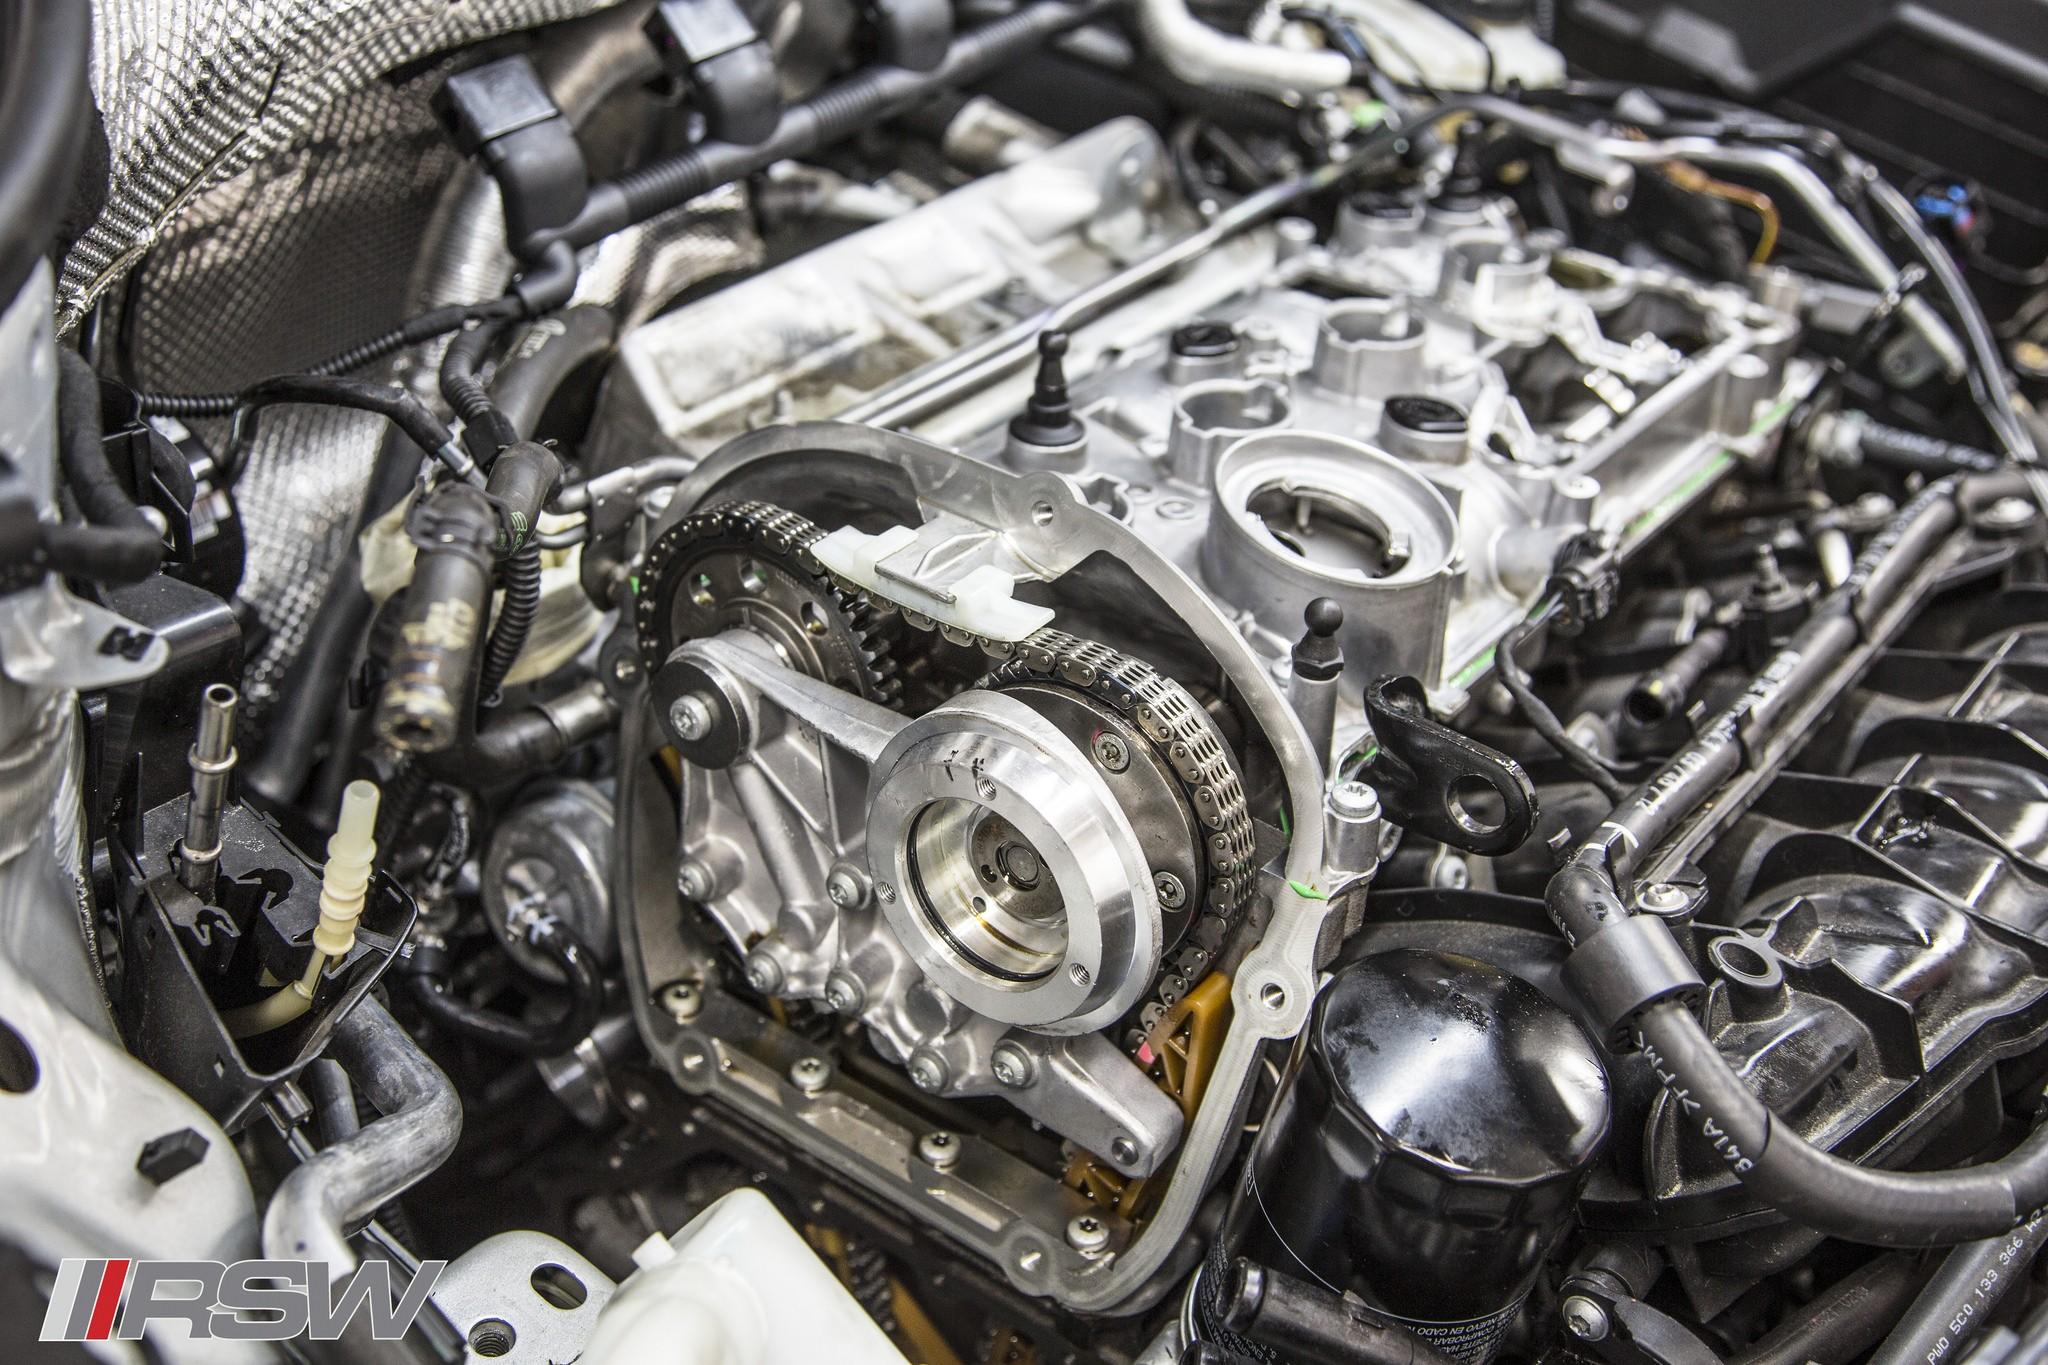 2 0 Tsi Engine Diagram 2 Volkswagen 2 0 Tsi Timing Chain Failures – atlantic Motorcar Of 2 0 Tsi Engine Diagram 2